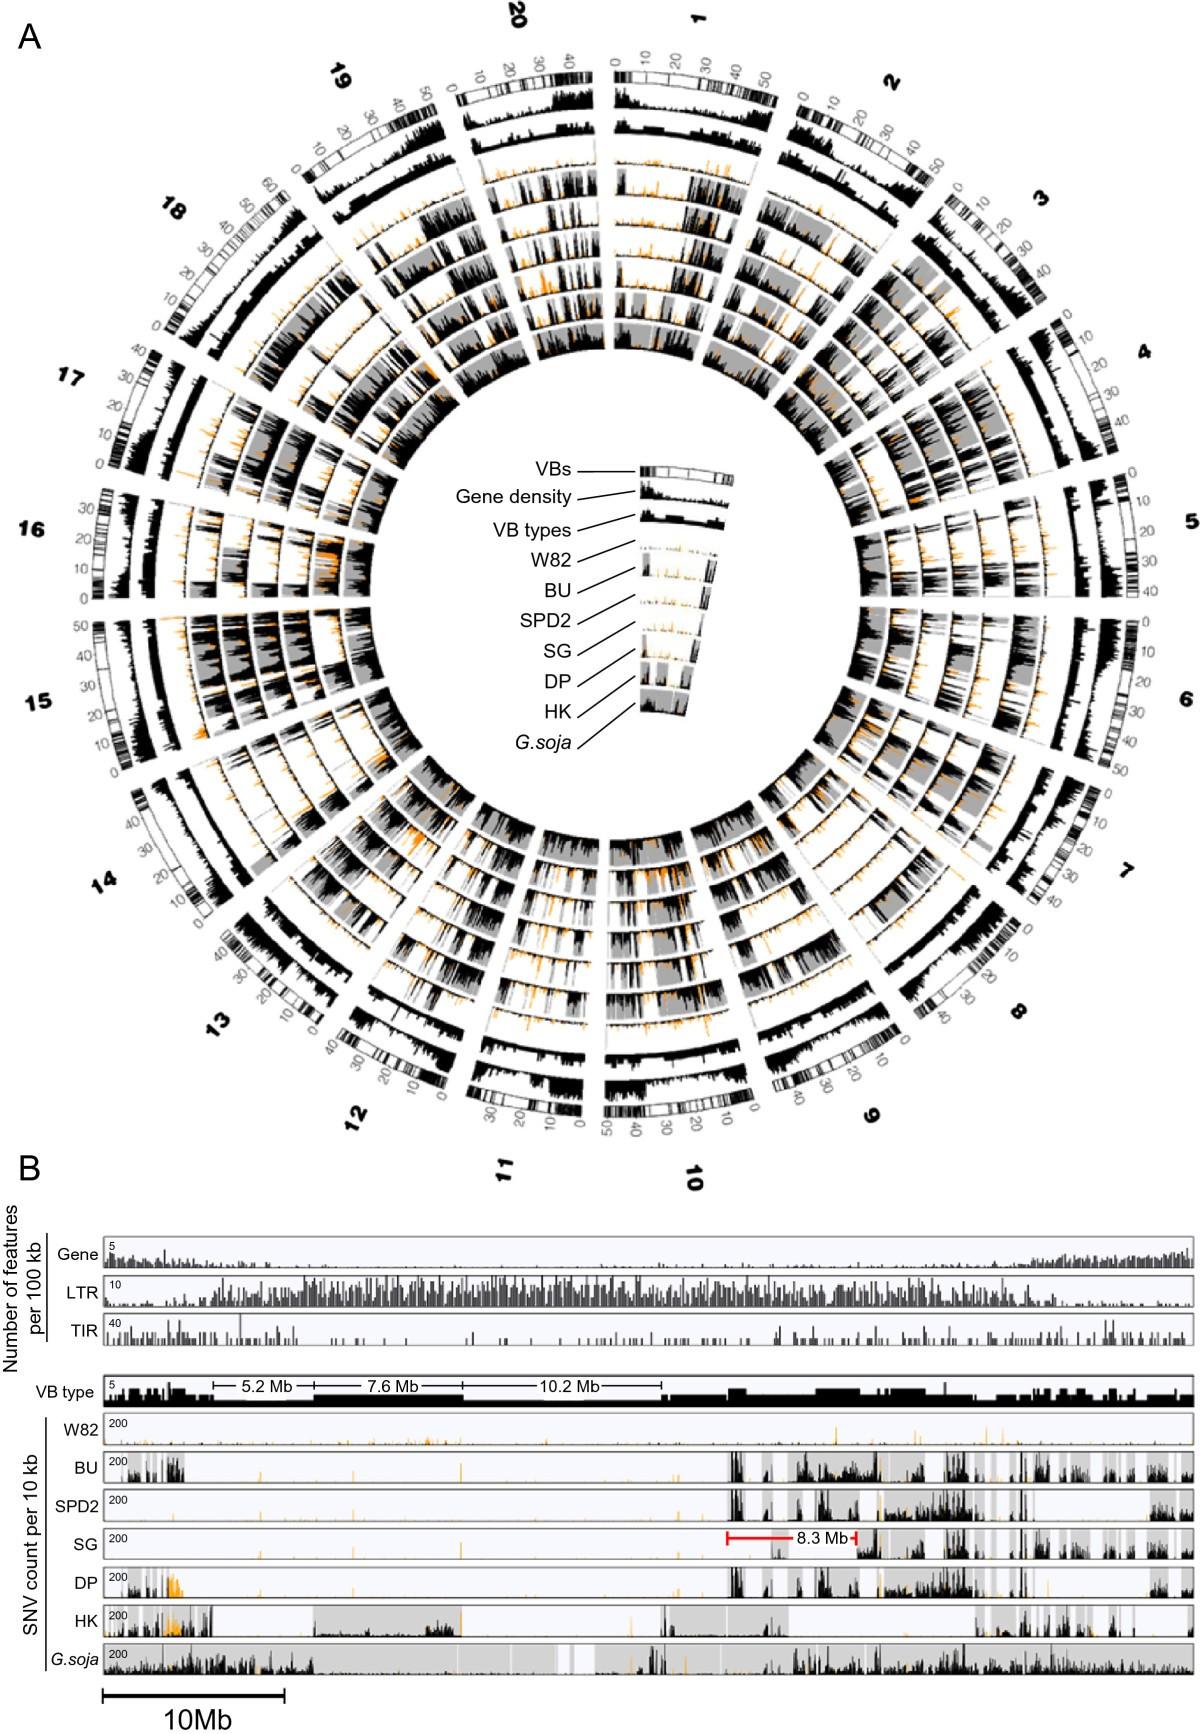 Variation Block Based Genomics Method For Crop Plants Bmc H 263 Diagram Figure 3